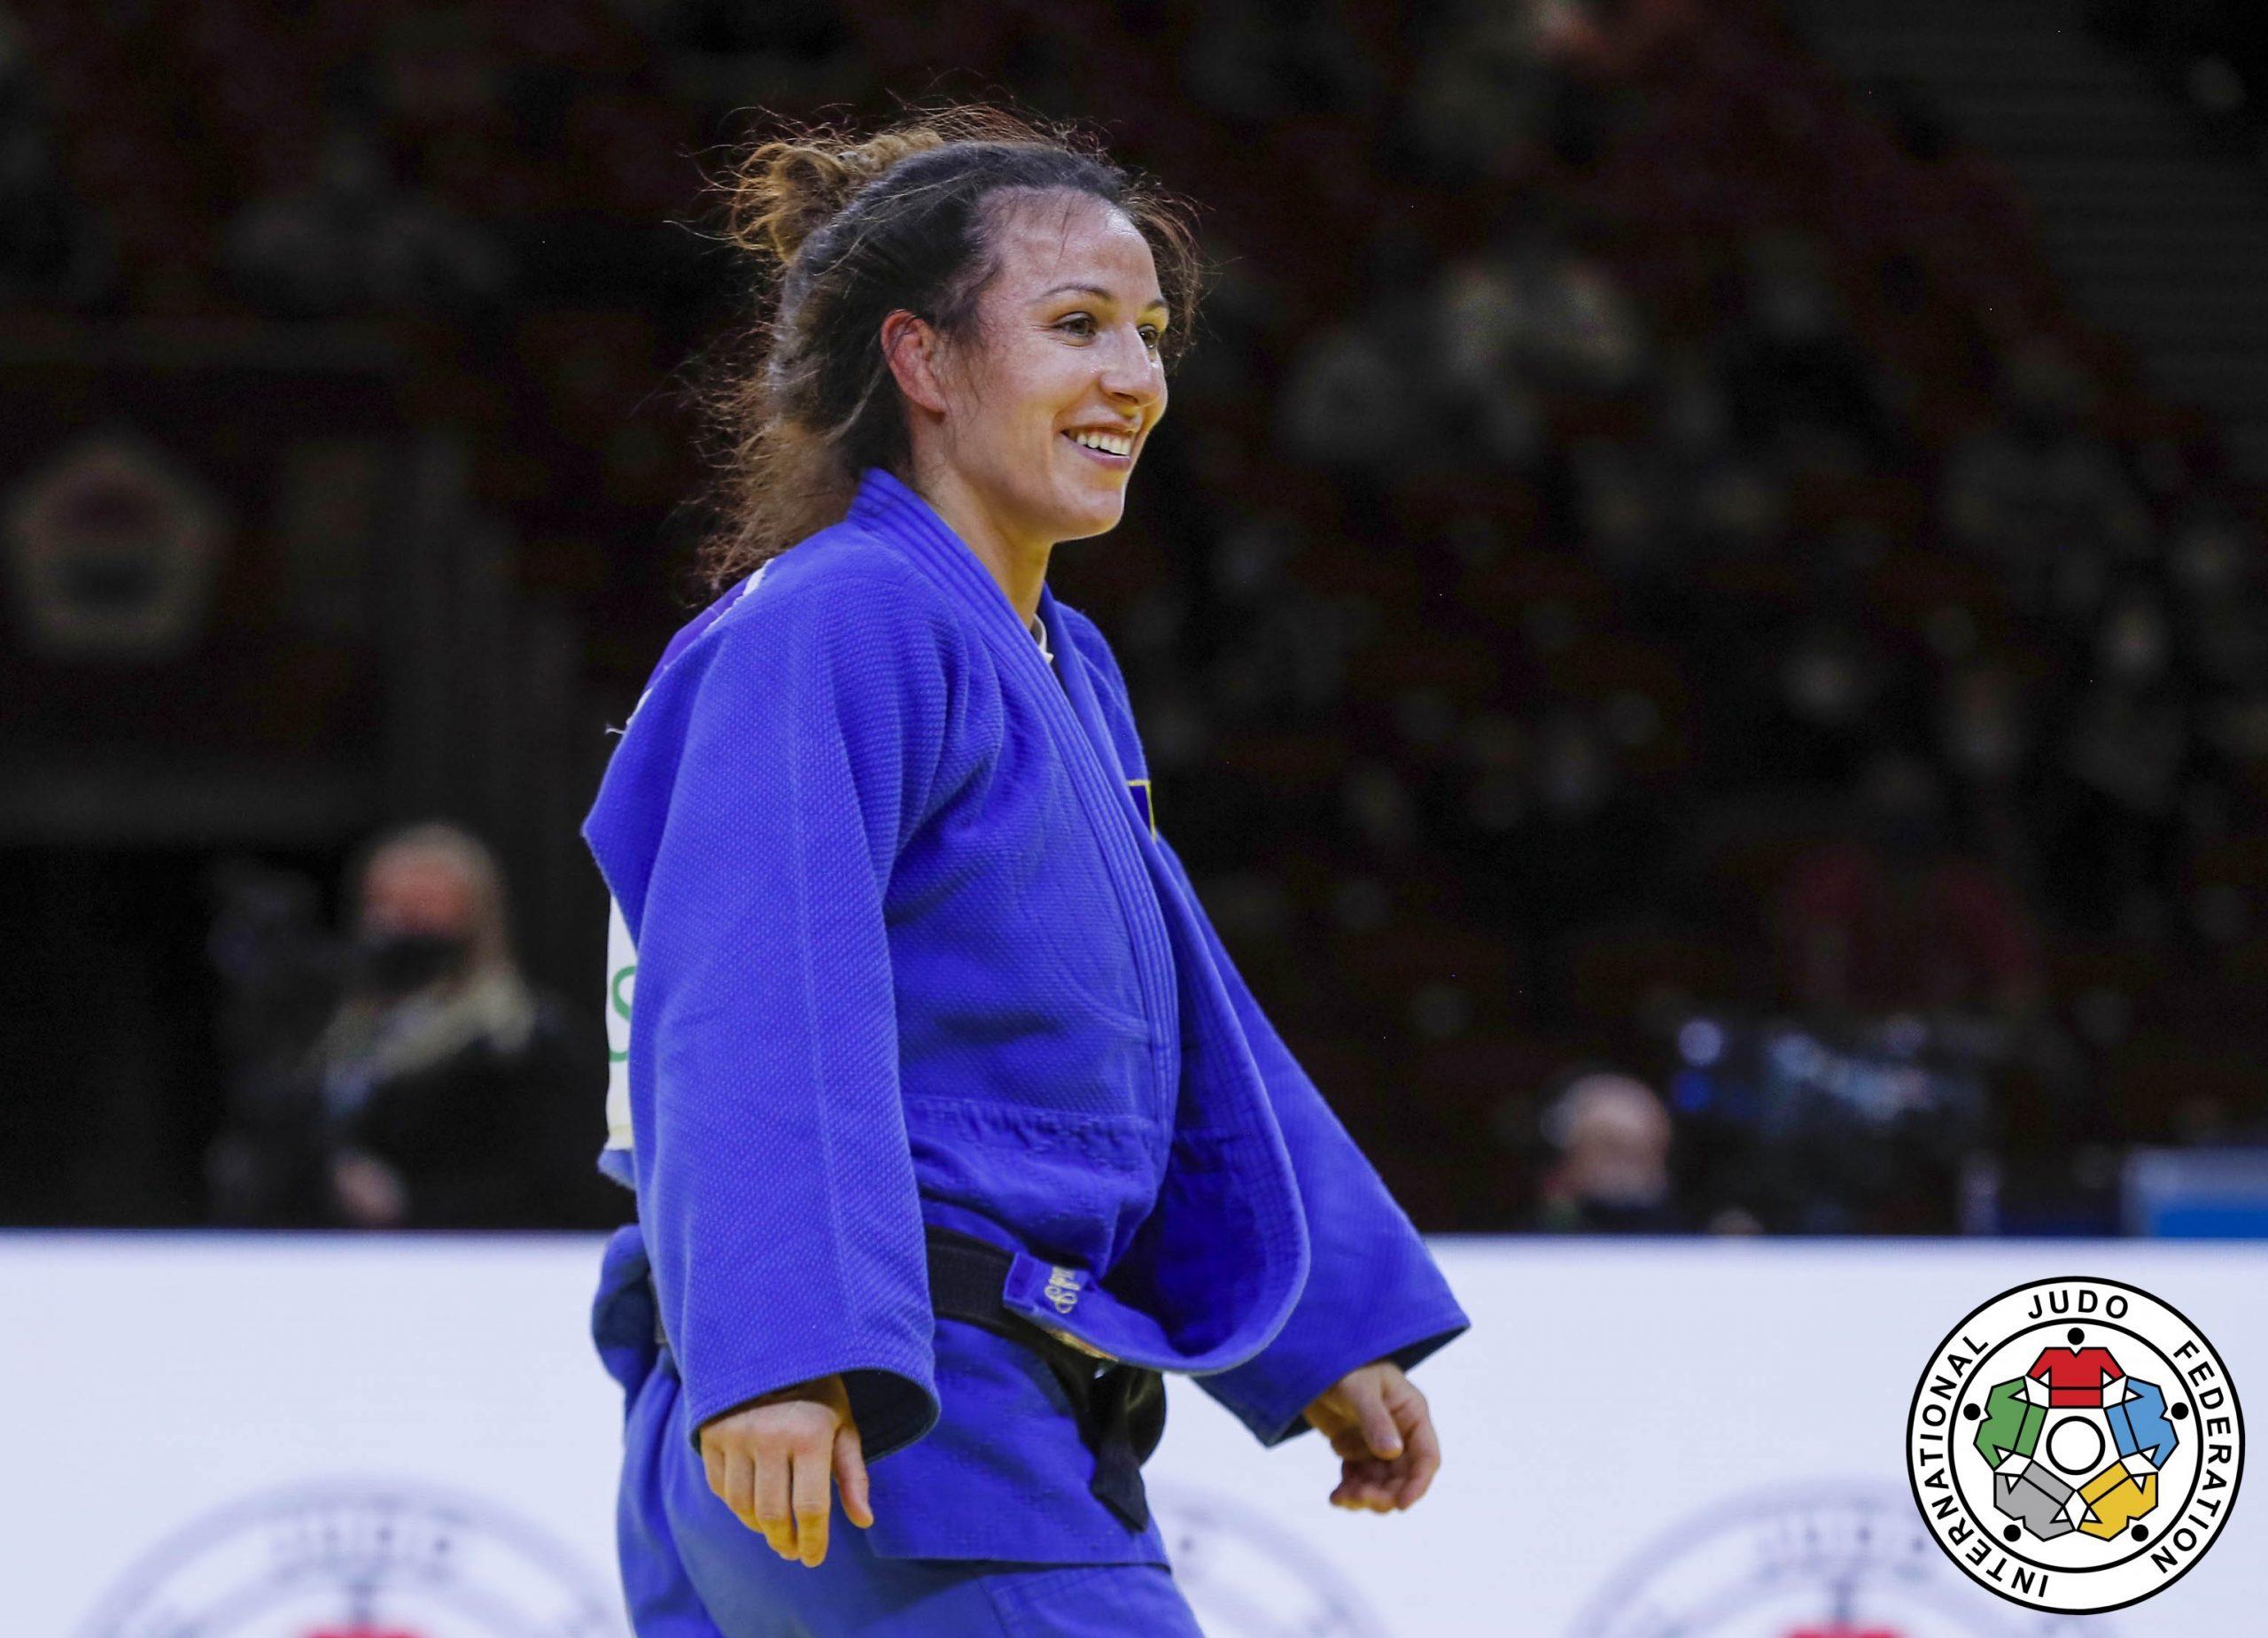 Judo: Andreea Chiţu, locul al treilea la Grand Slam-ul de la Budapesta